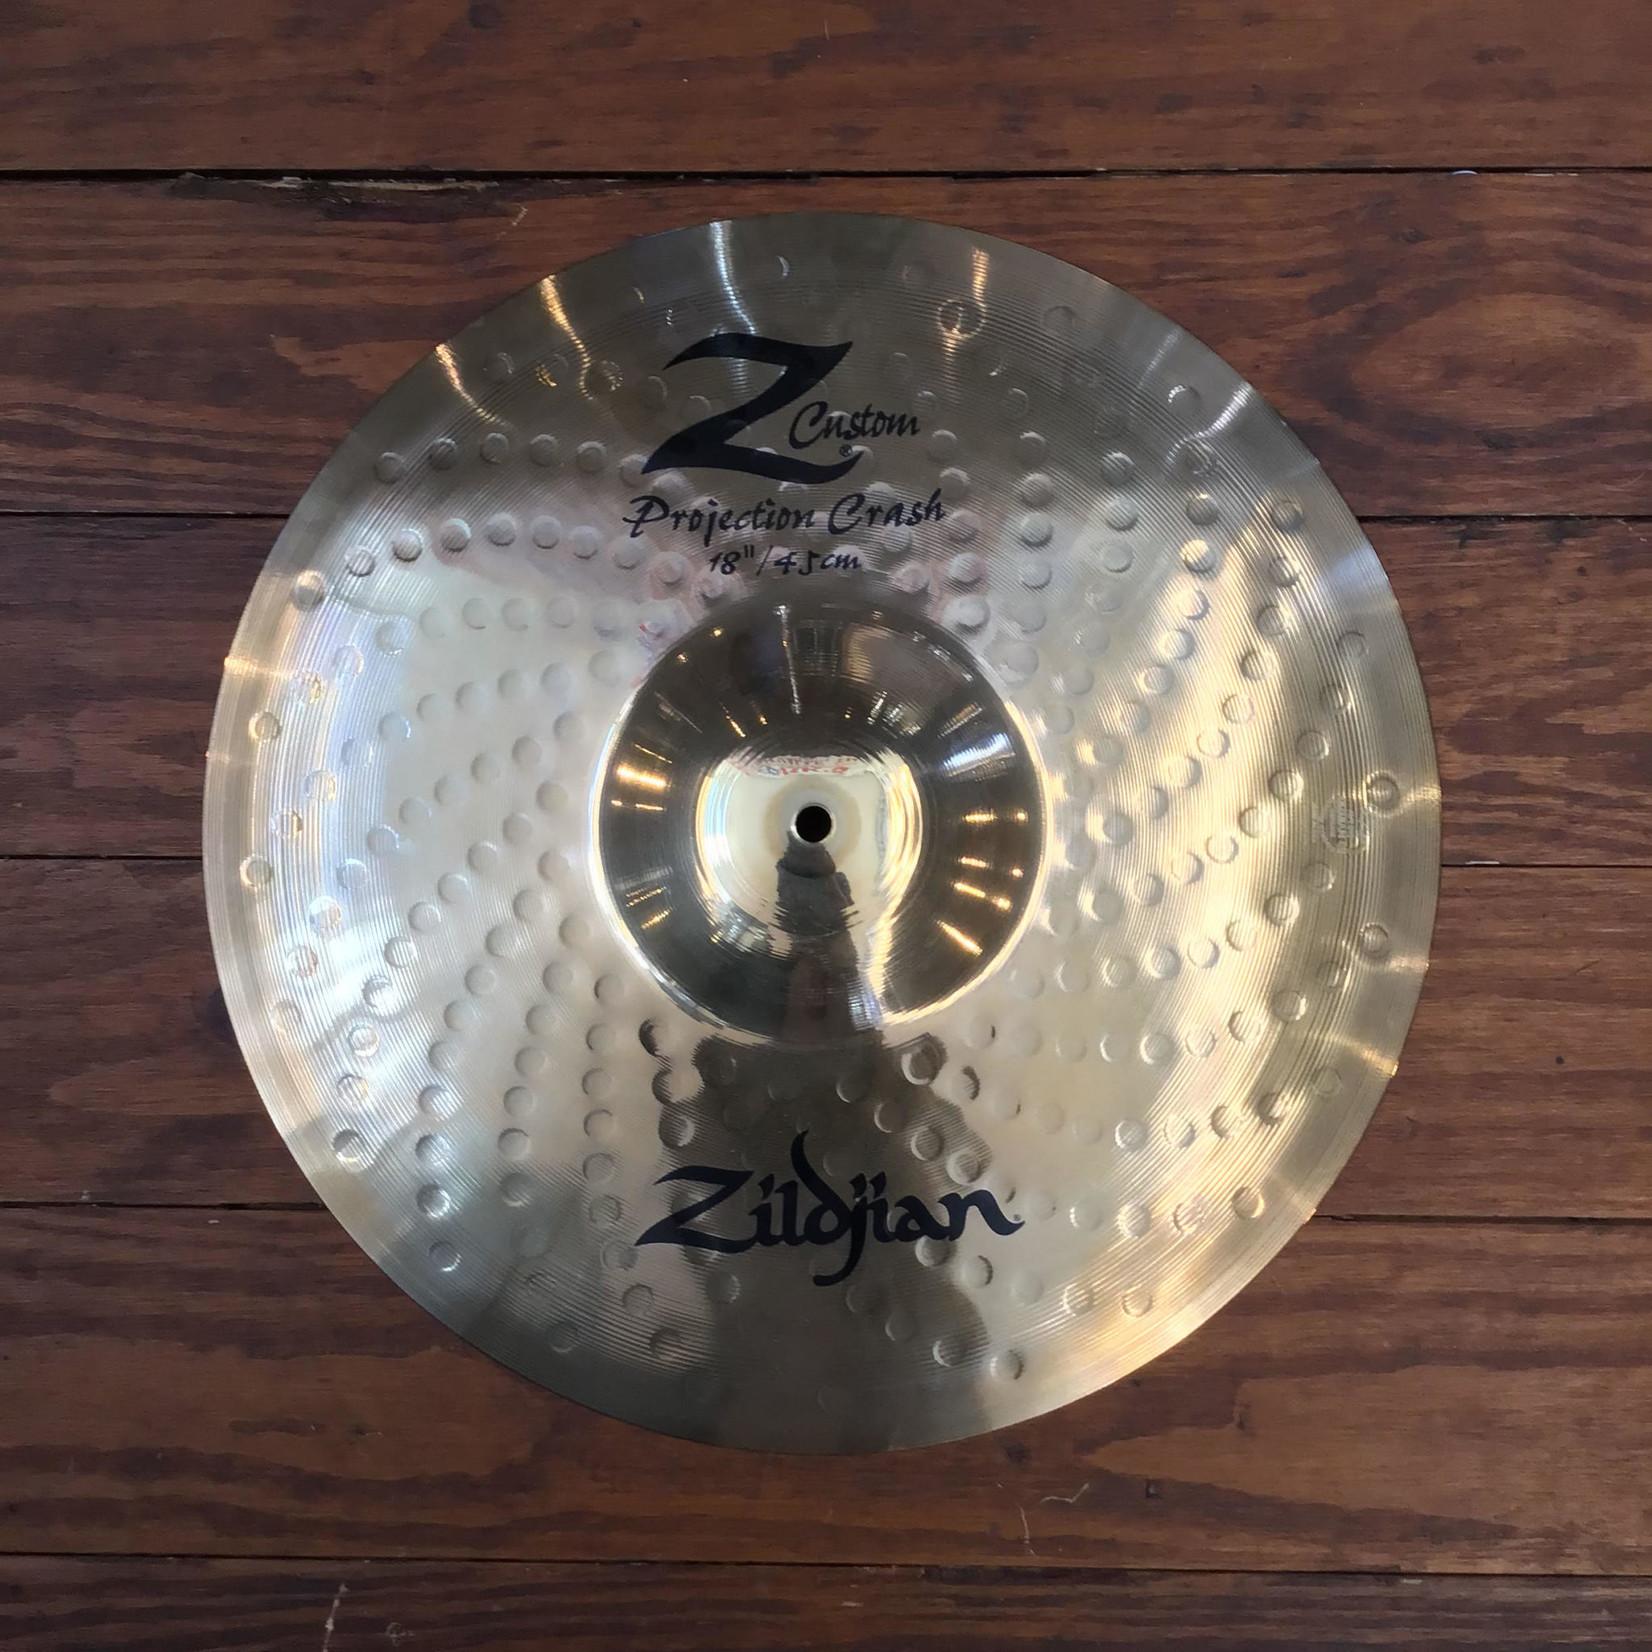 "Zildjian USED Zildjian Z Custom 18"" Projection Crash Cymbal"